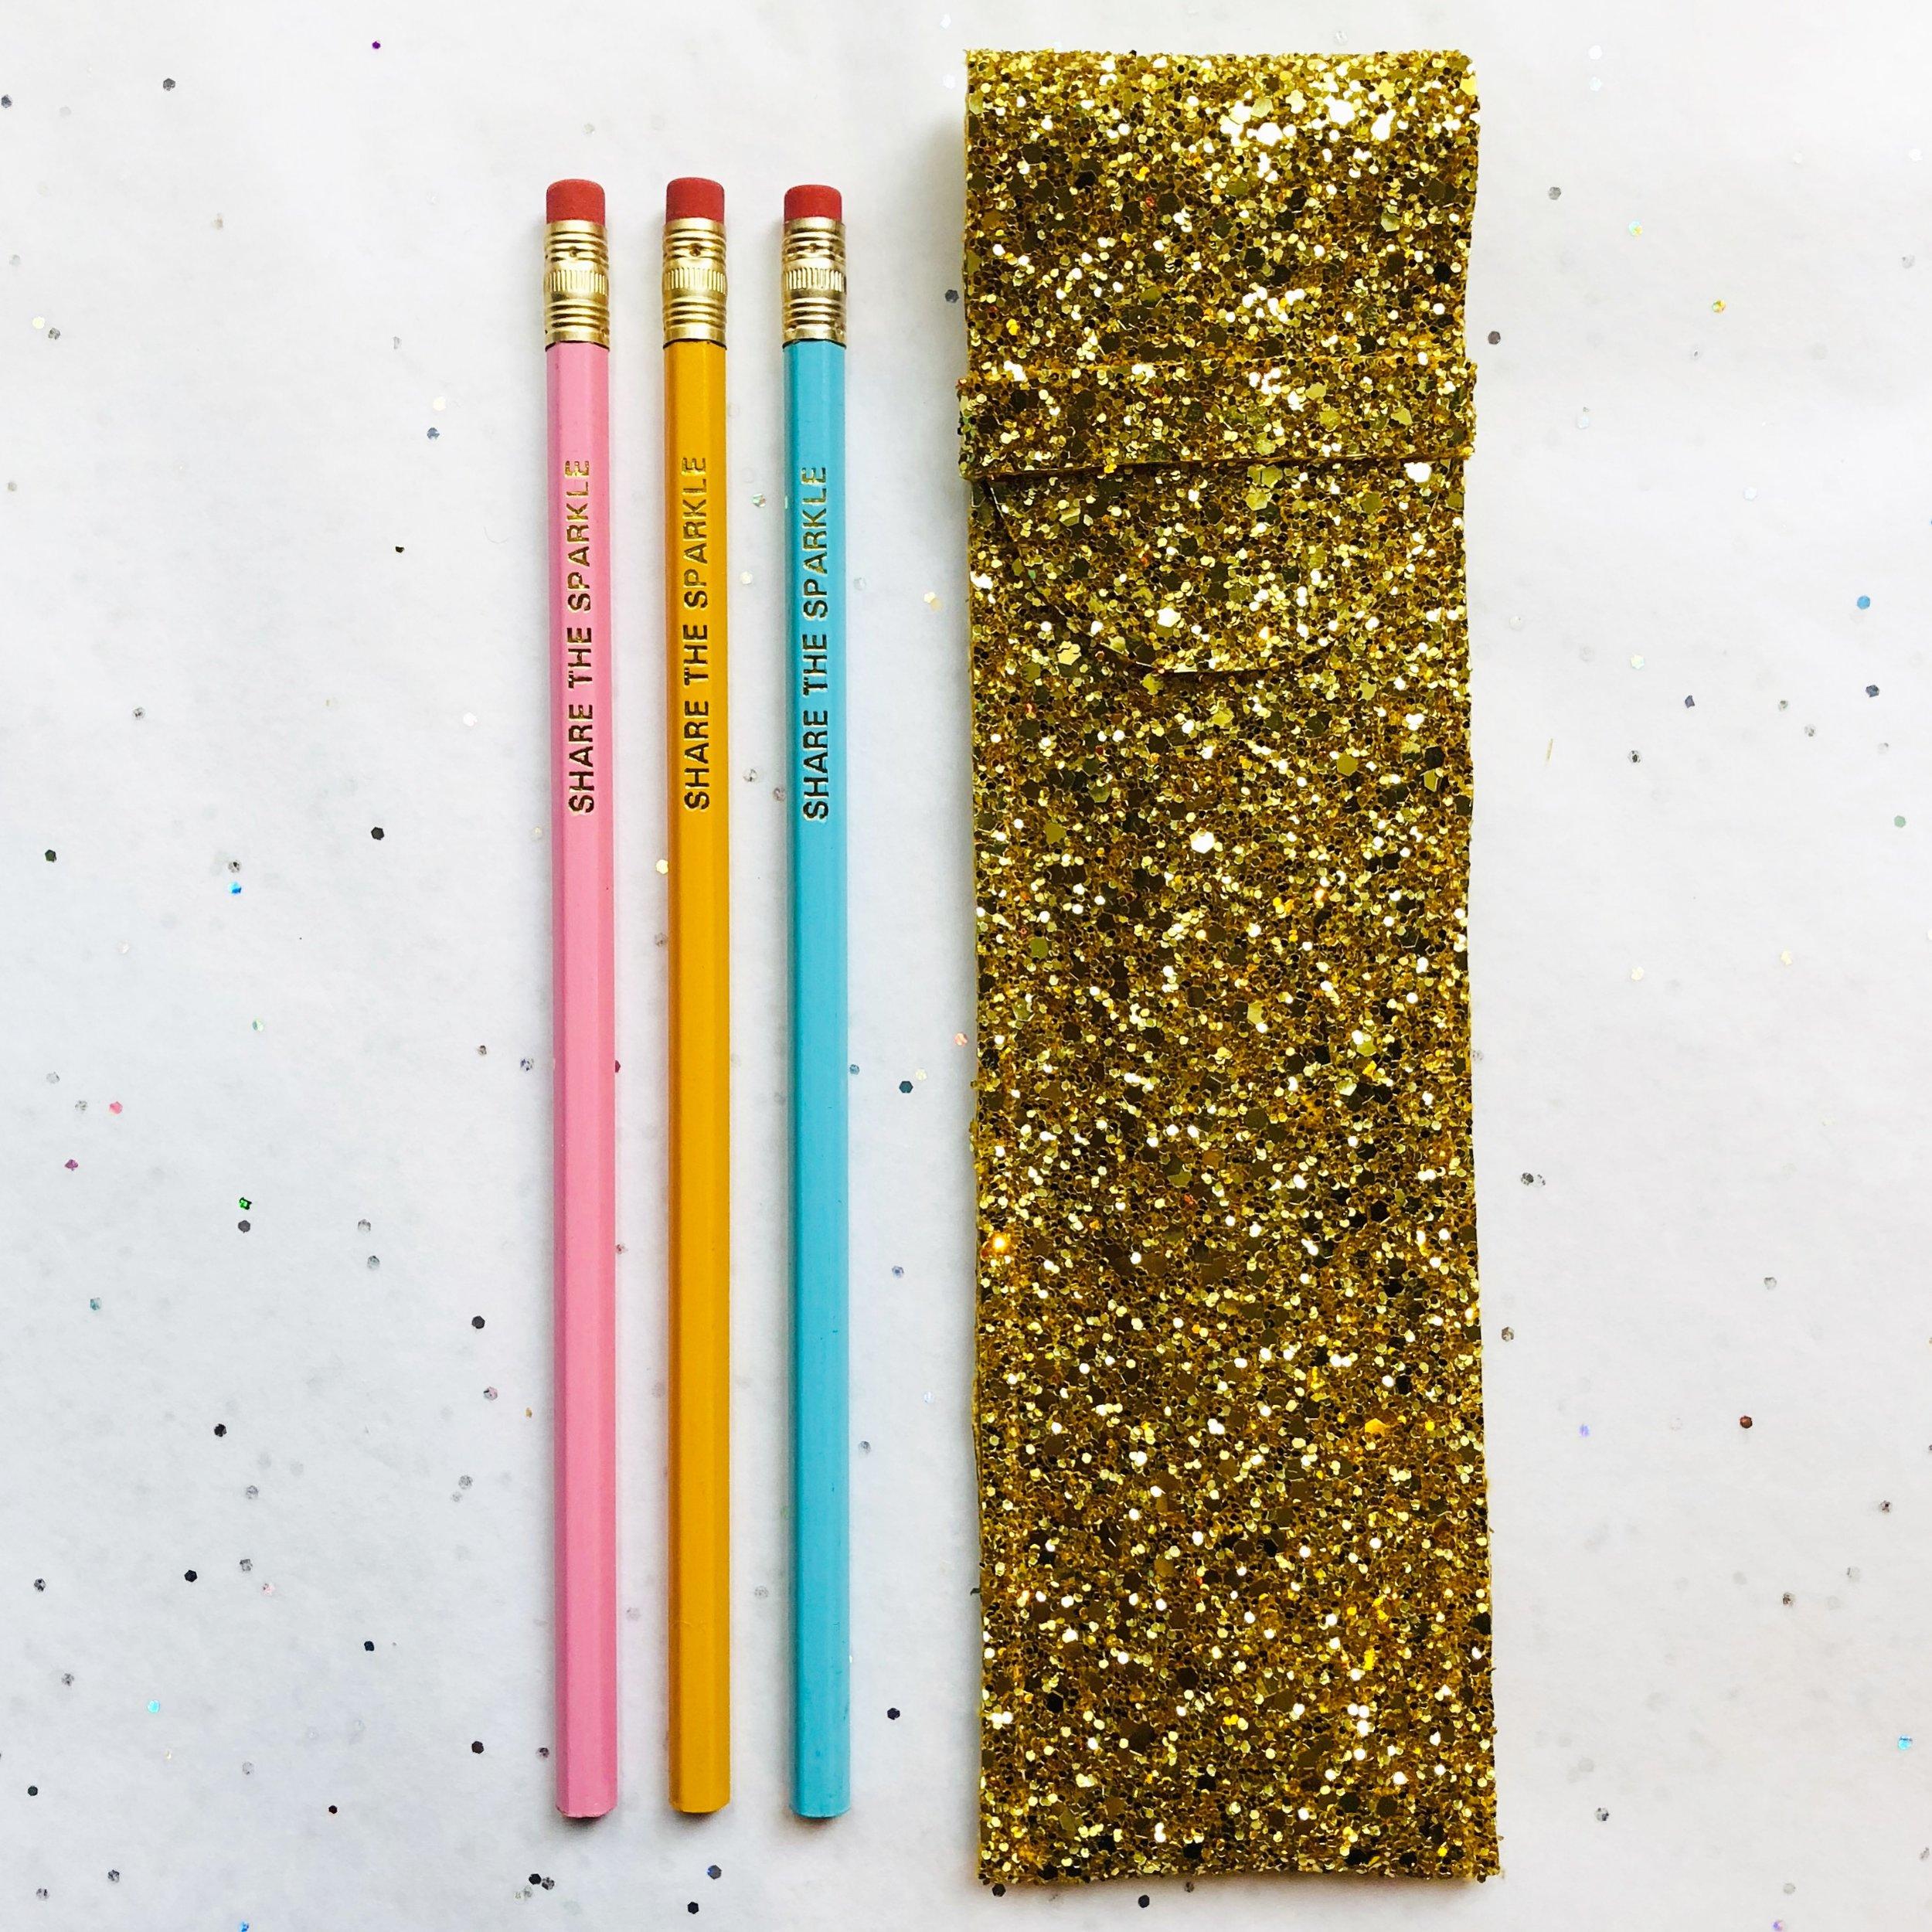 Share the Sparkle Pencil case